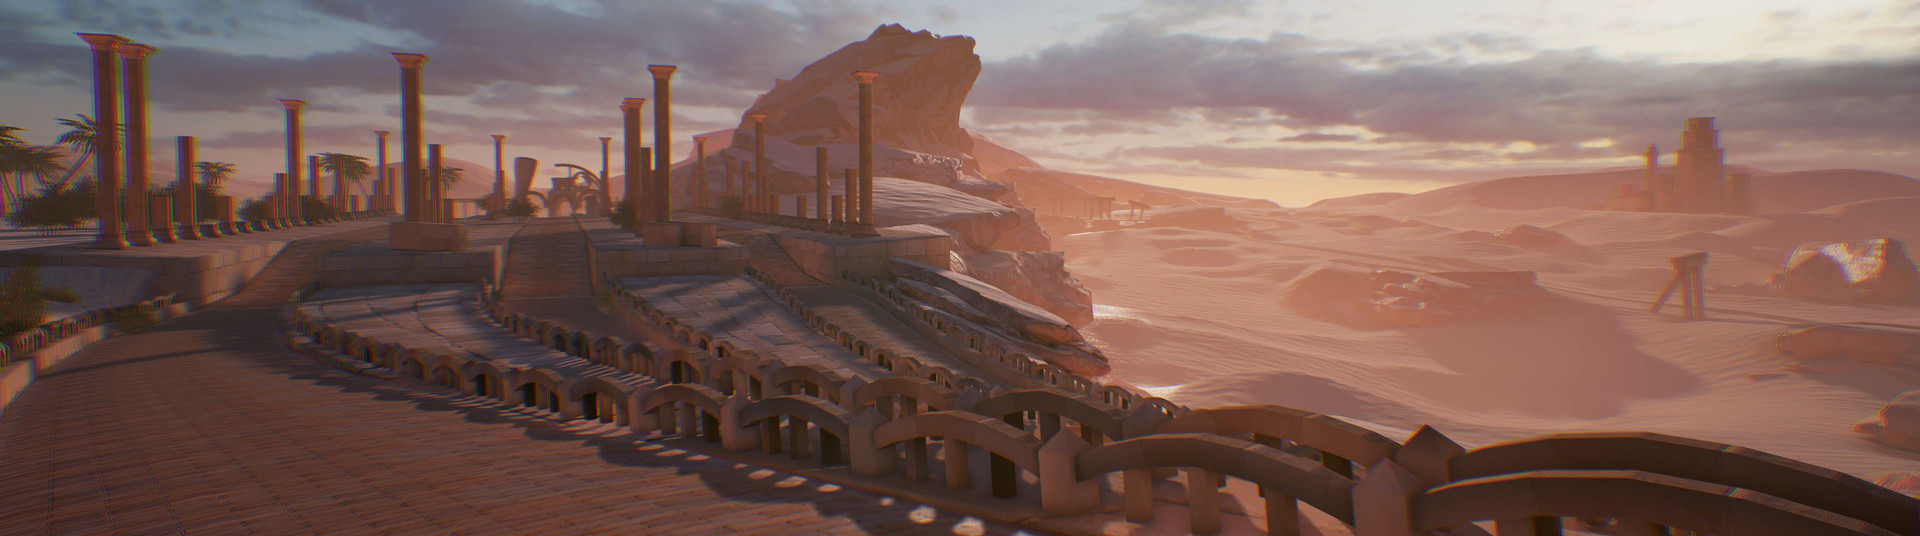 Florian thomasset desert temple 7